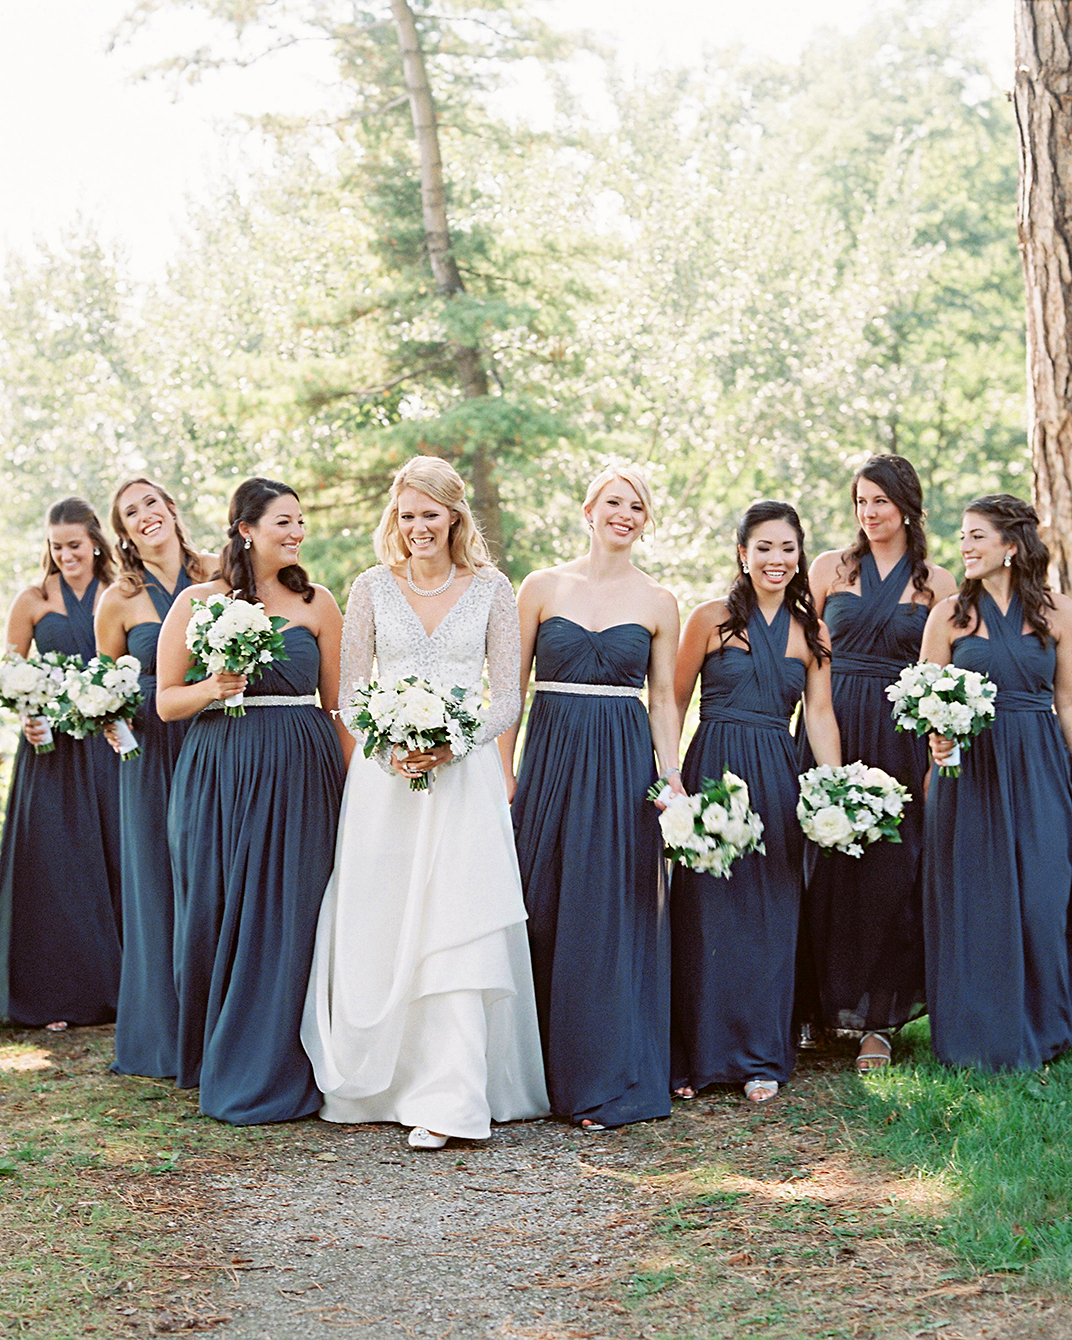 stephanie matt bride and bridesmaids